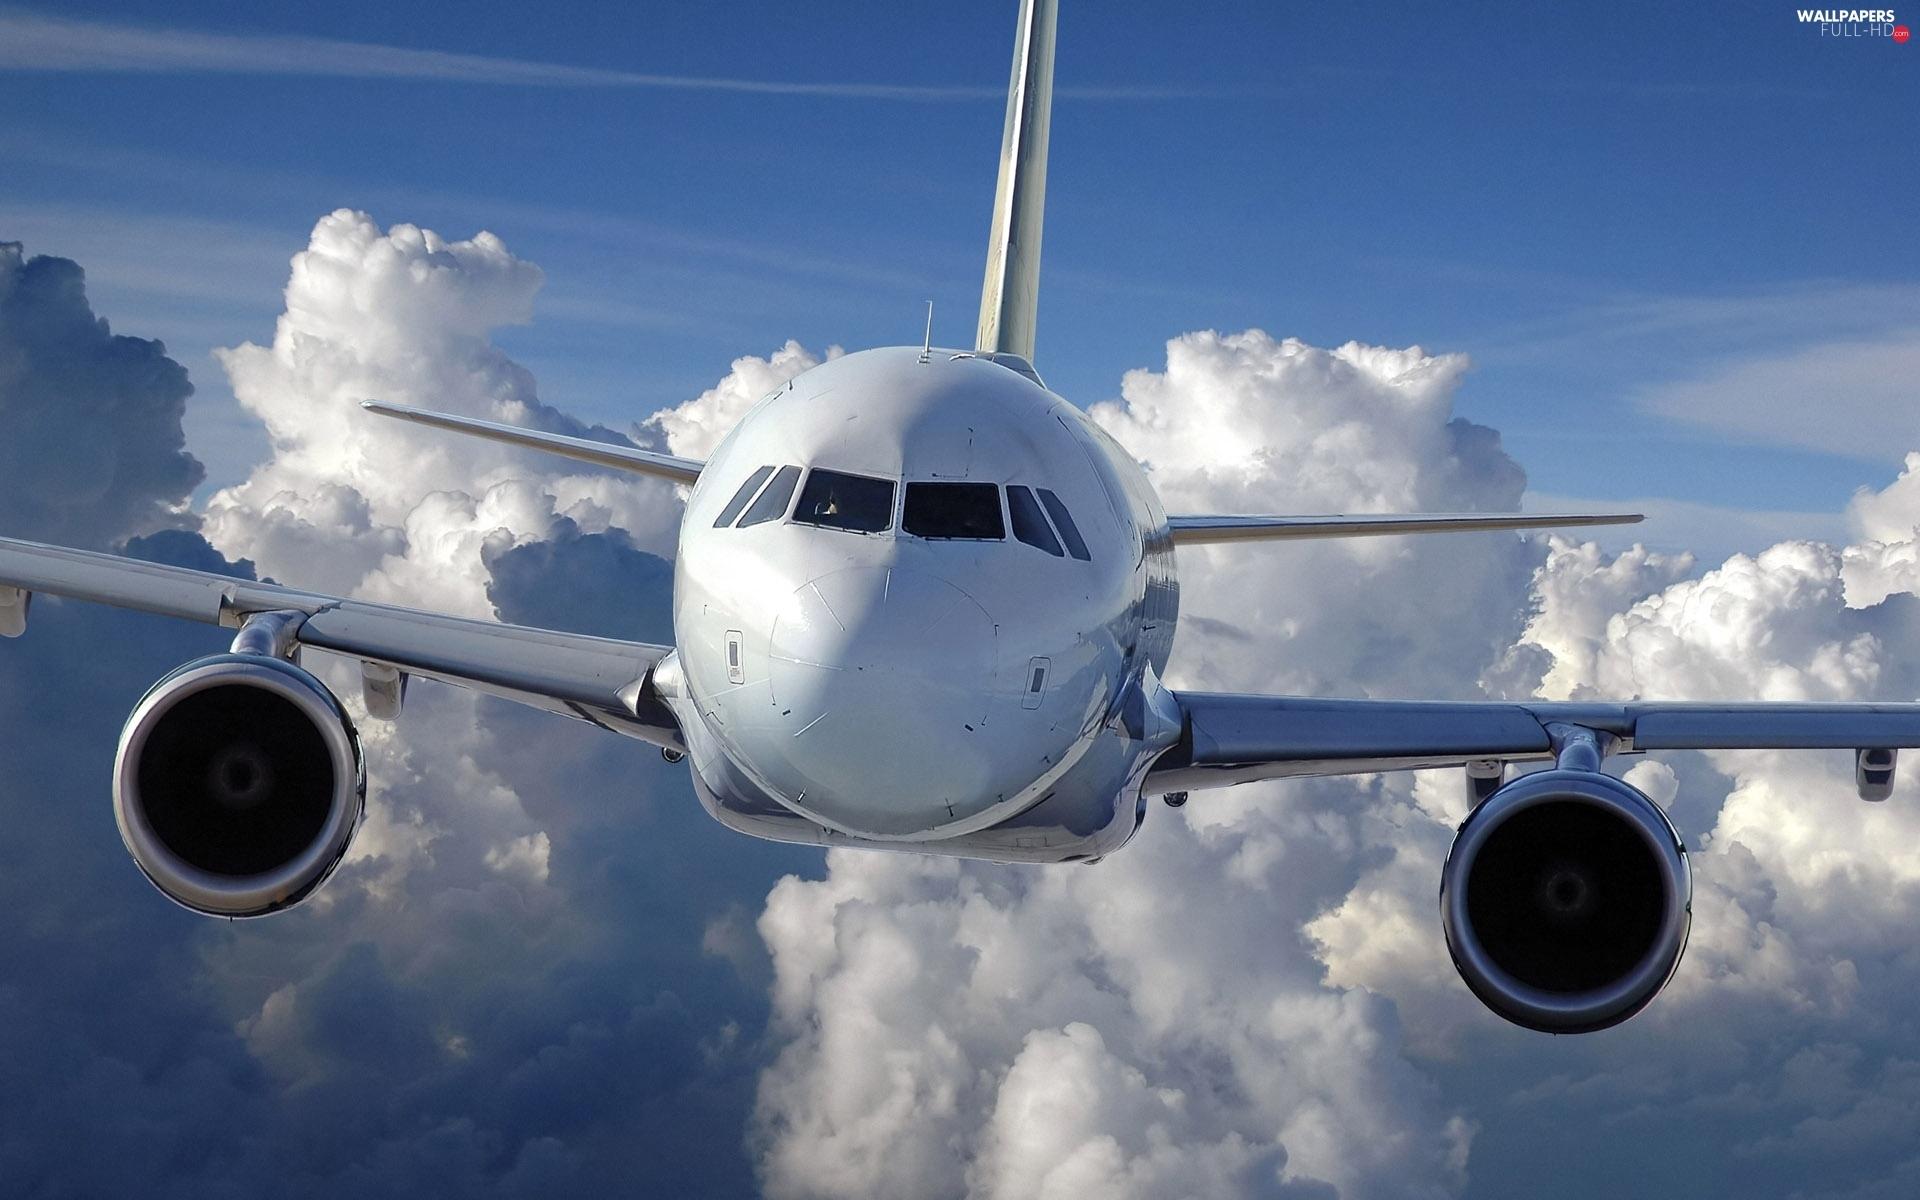 Sky clouds plane passenger   Full HD Wallpapers 1920x1200 1920x1200